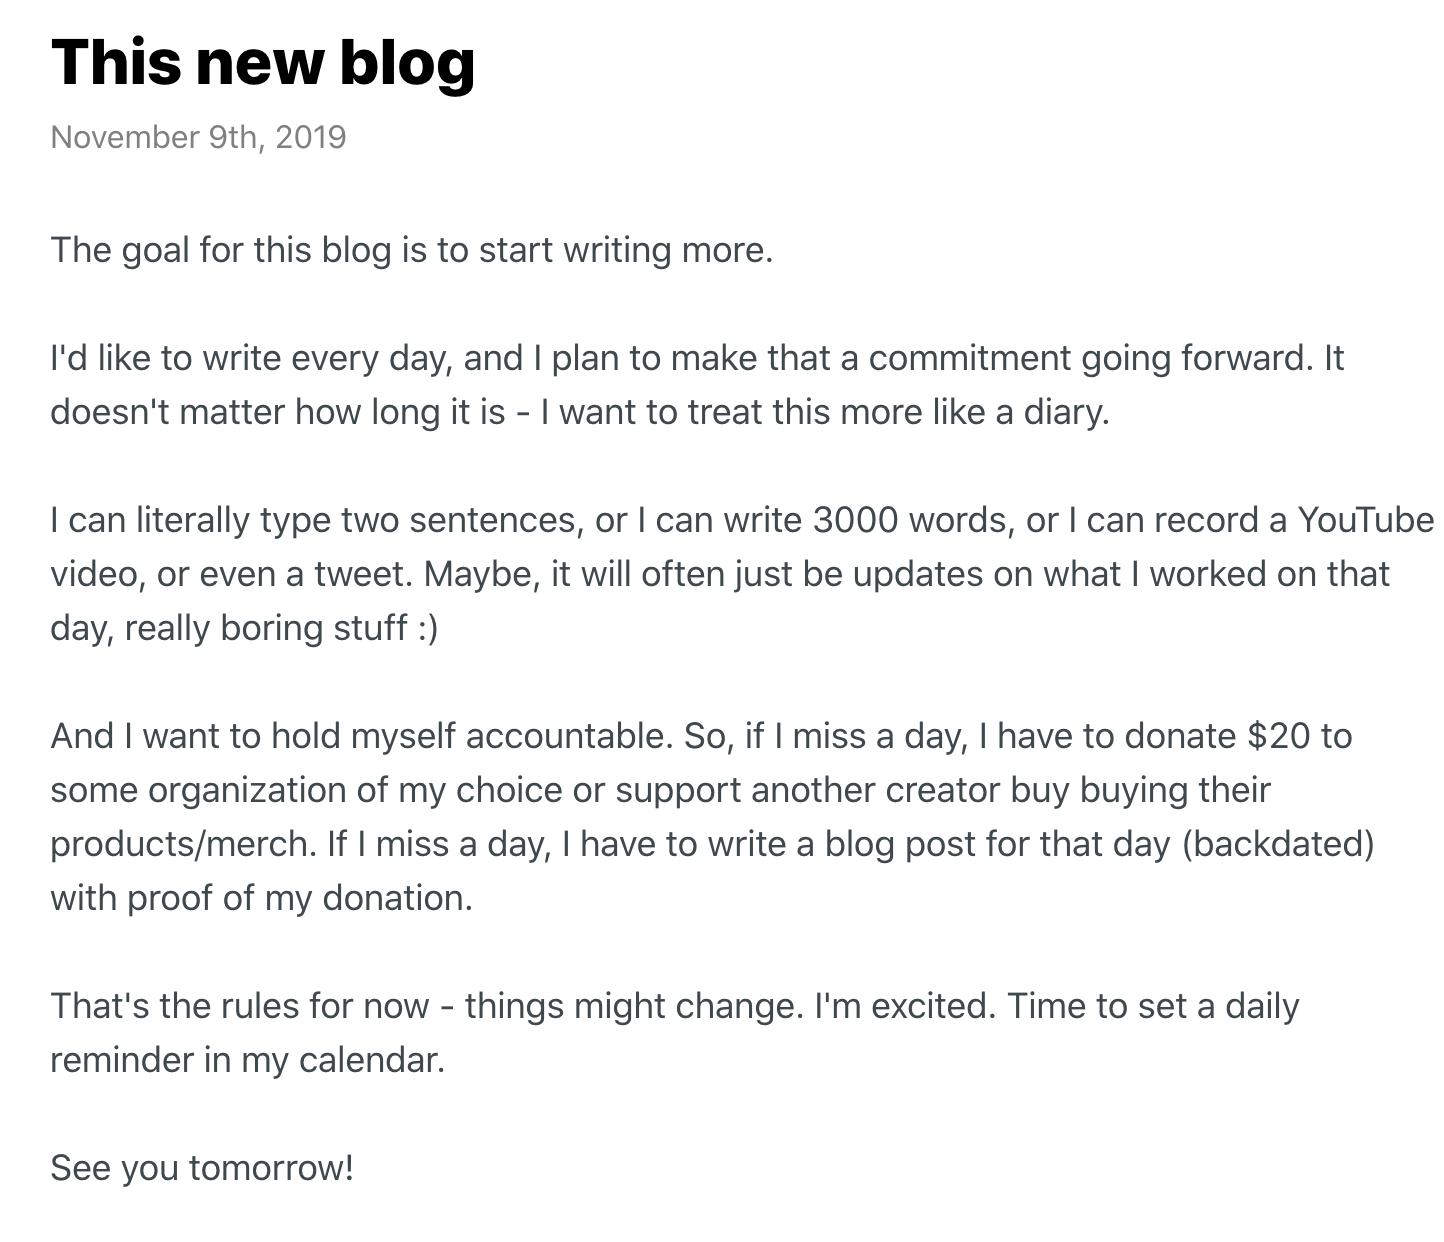 image of blog post